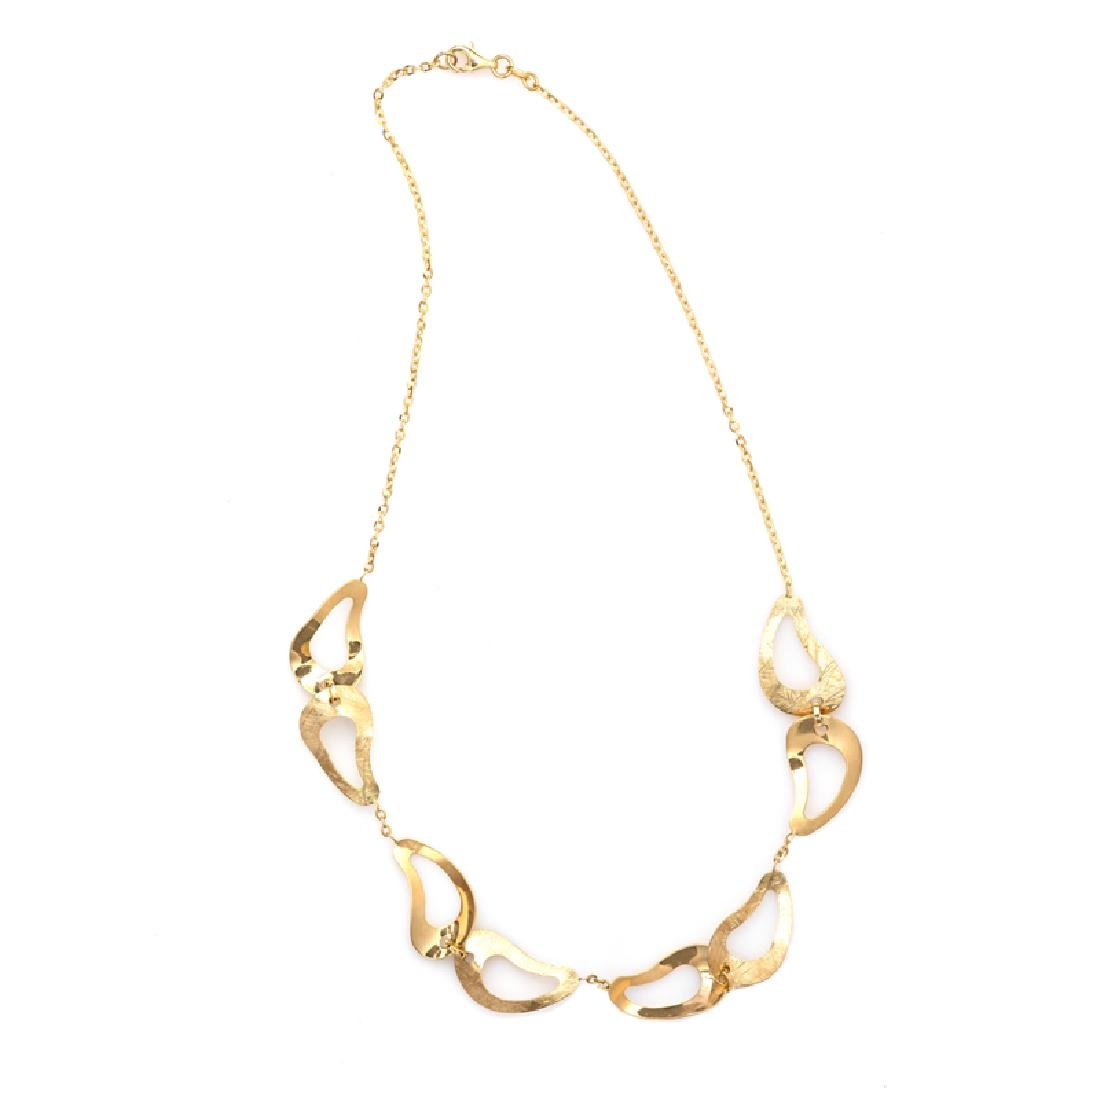 *Fine Jewelry 14 KT Gold, Diamond Cut, Oval Link,